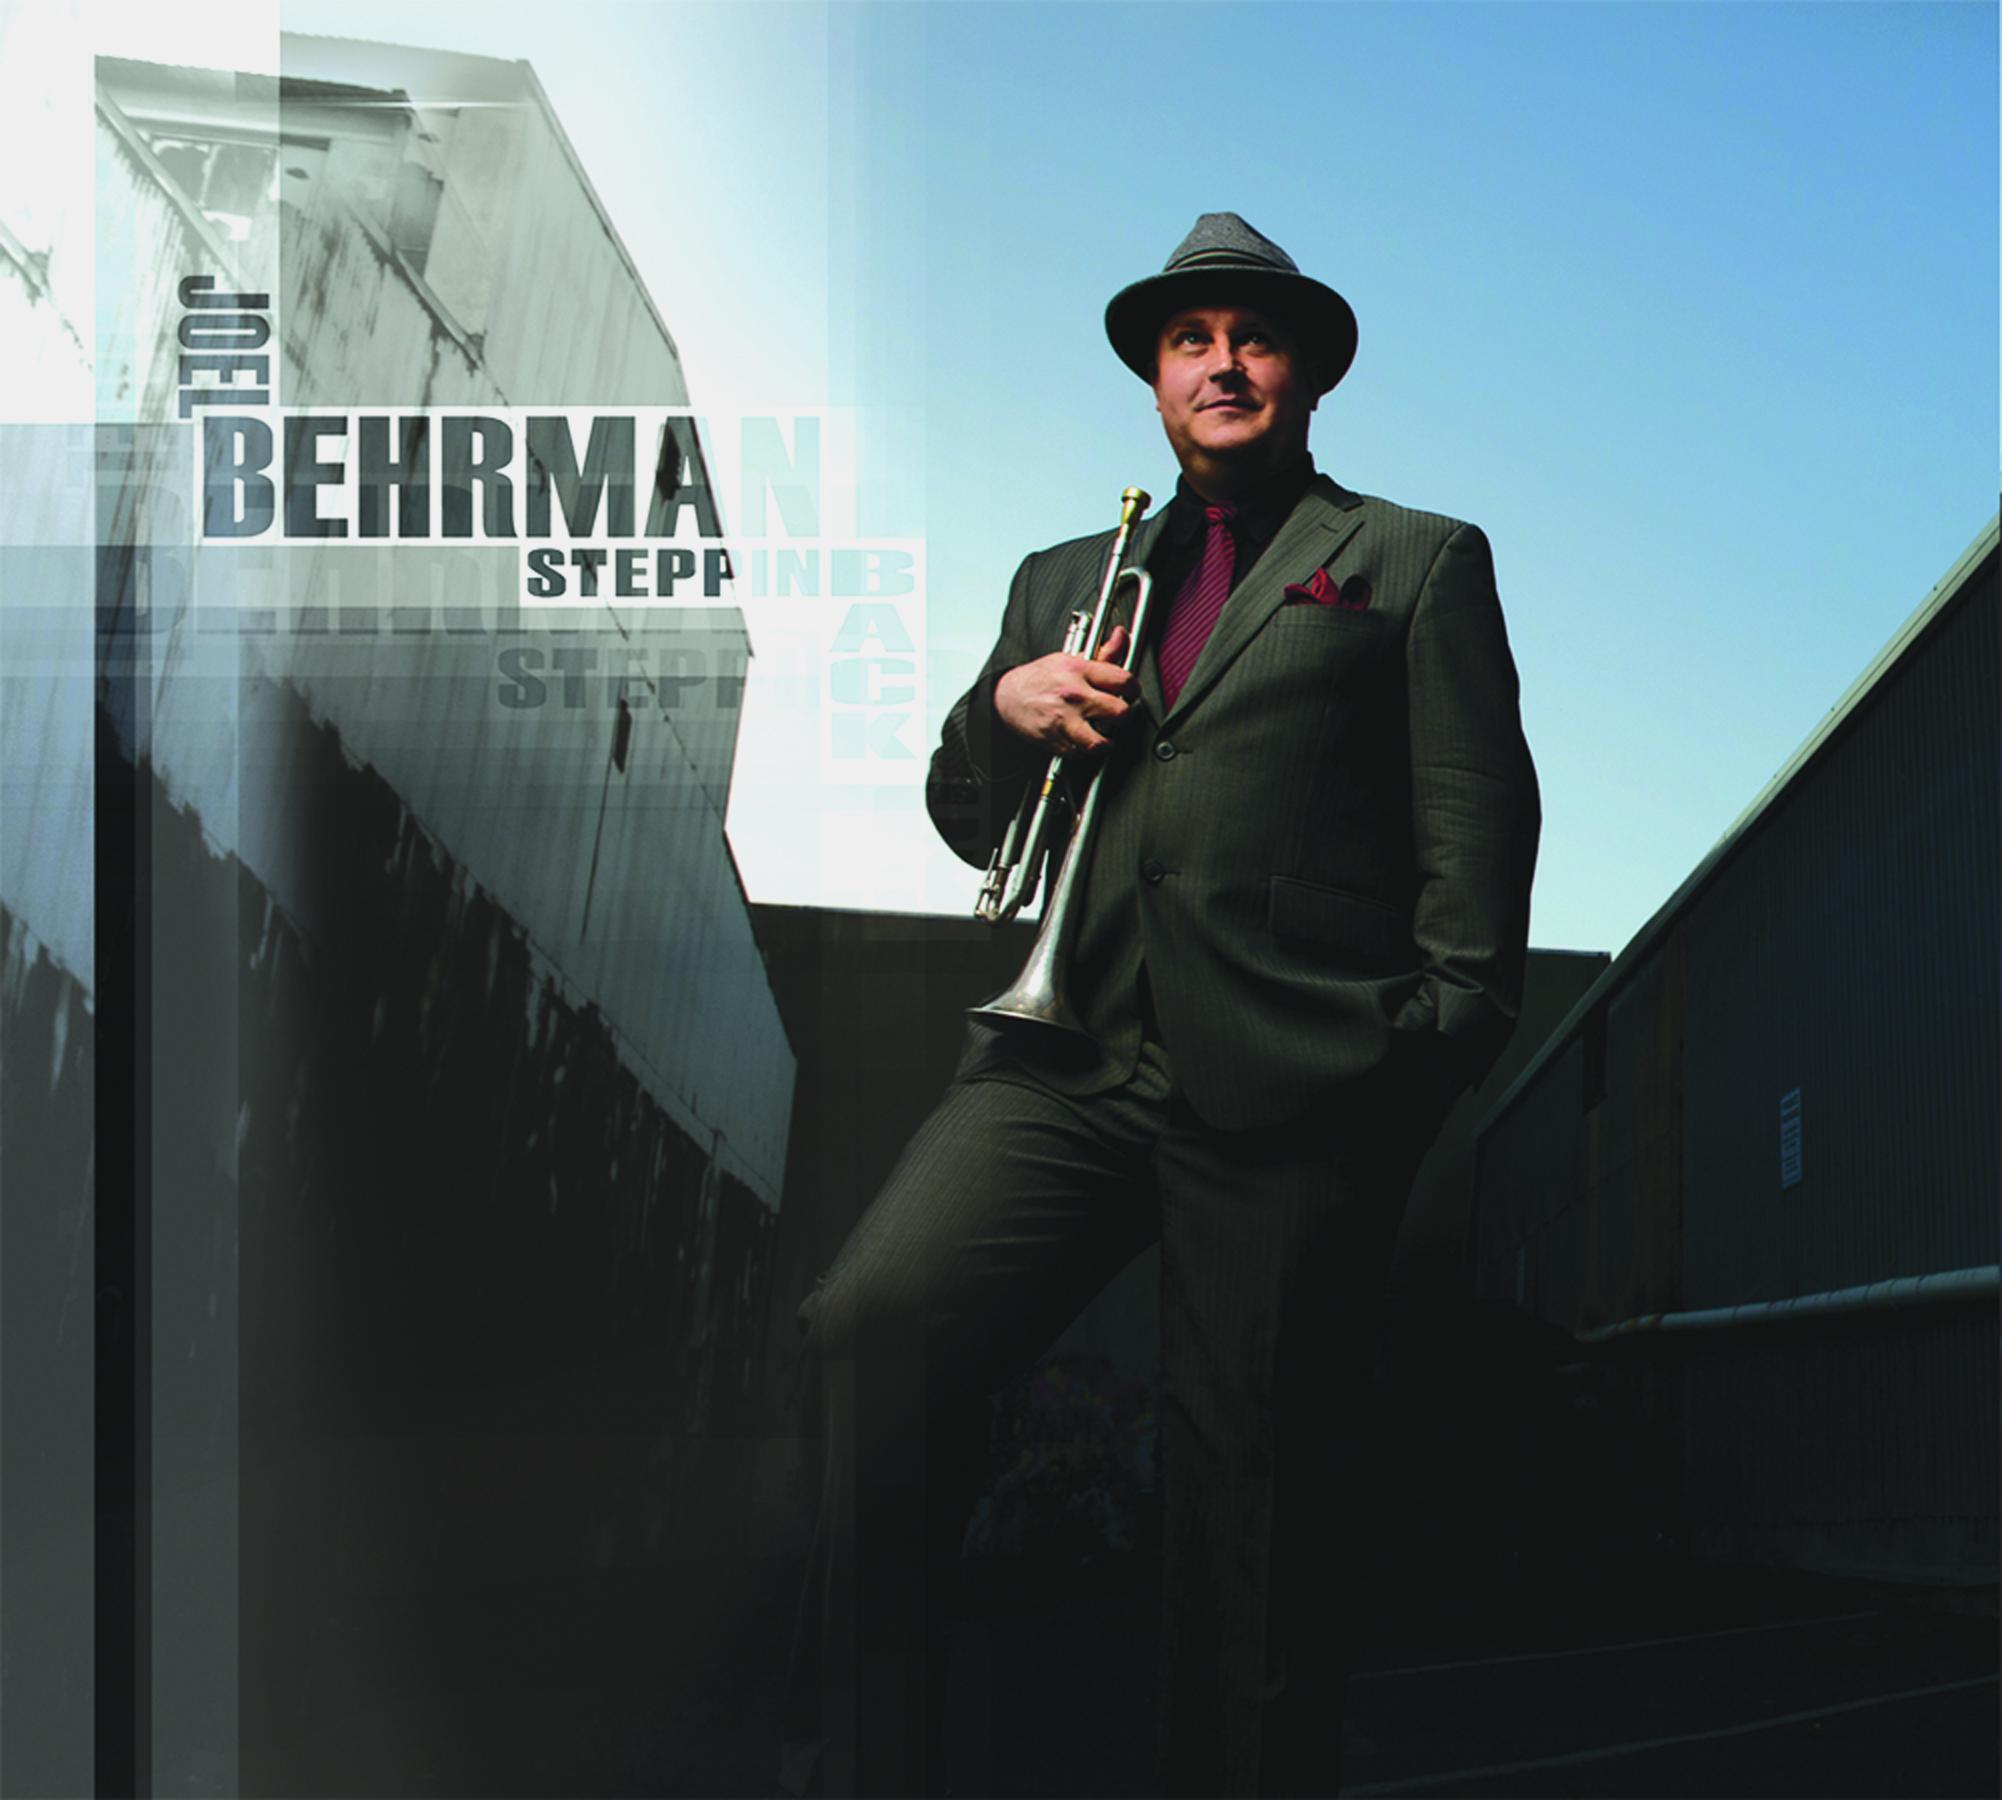 Joel Behrman